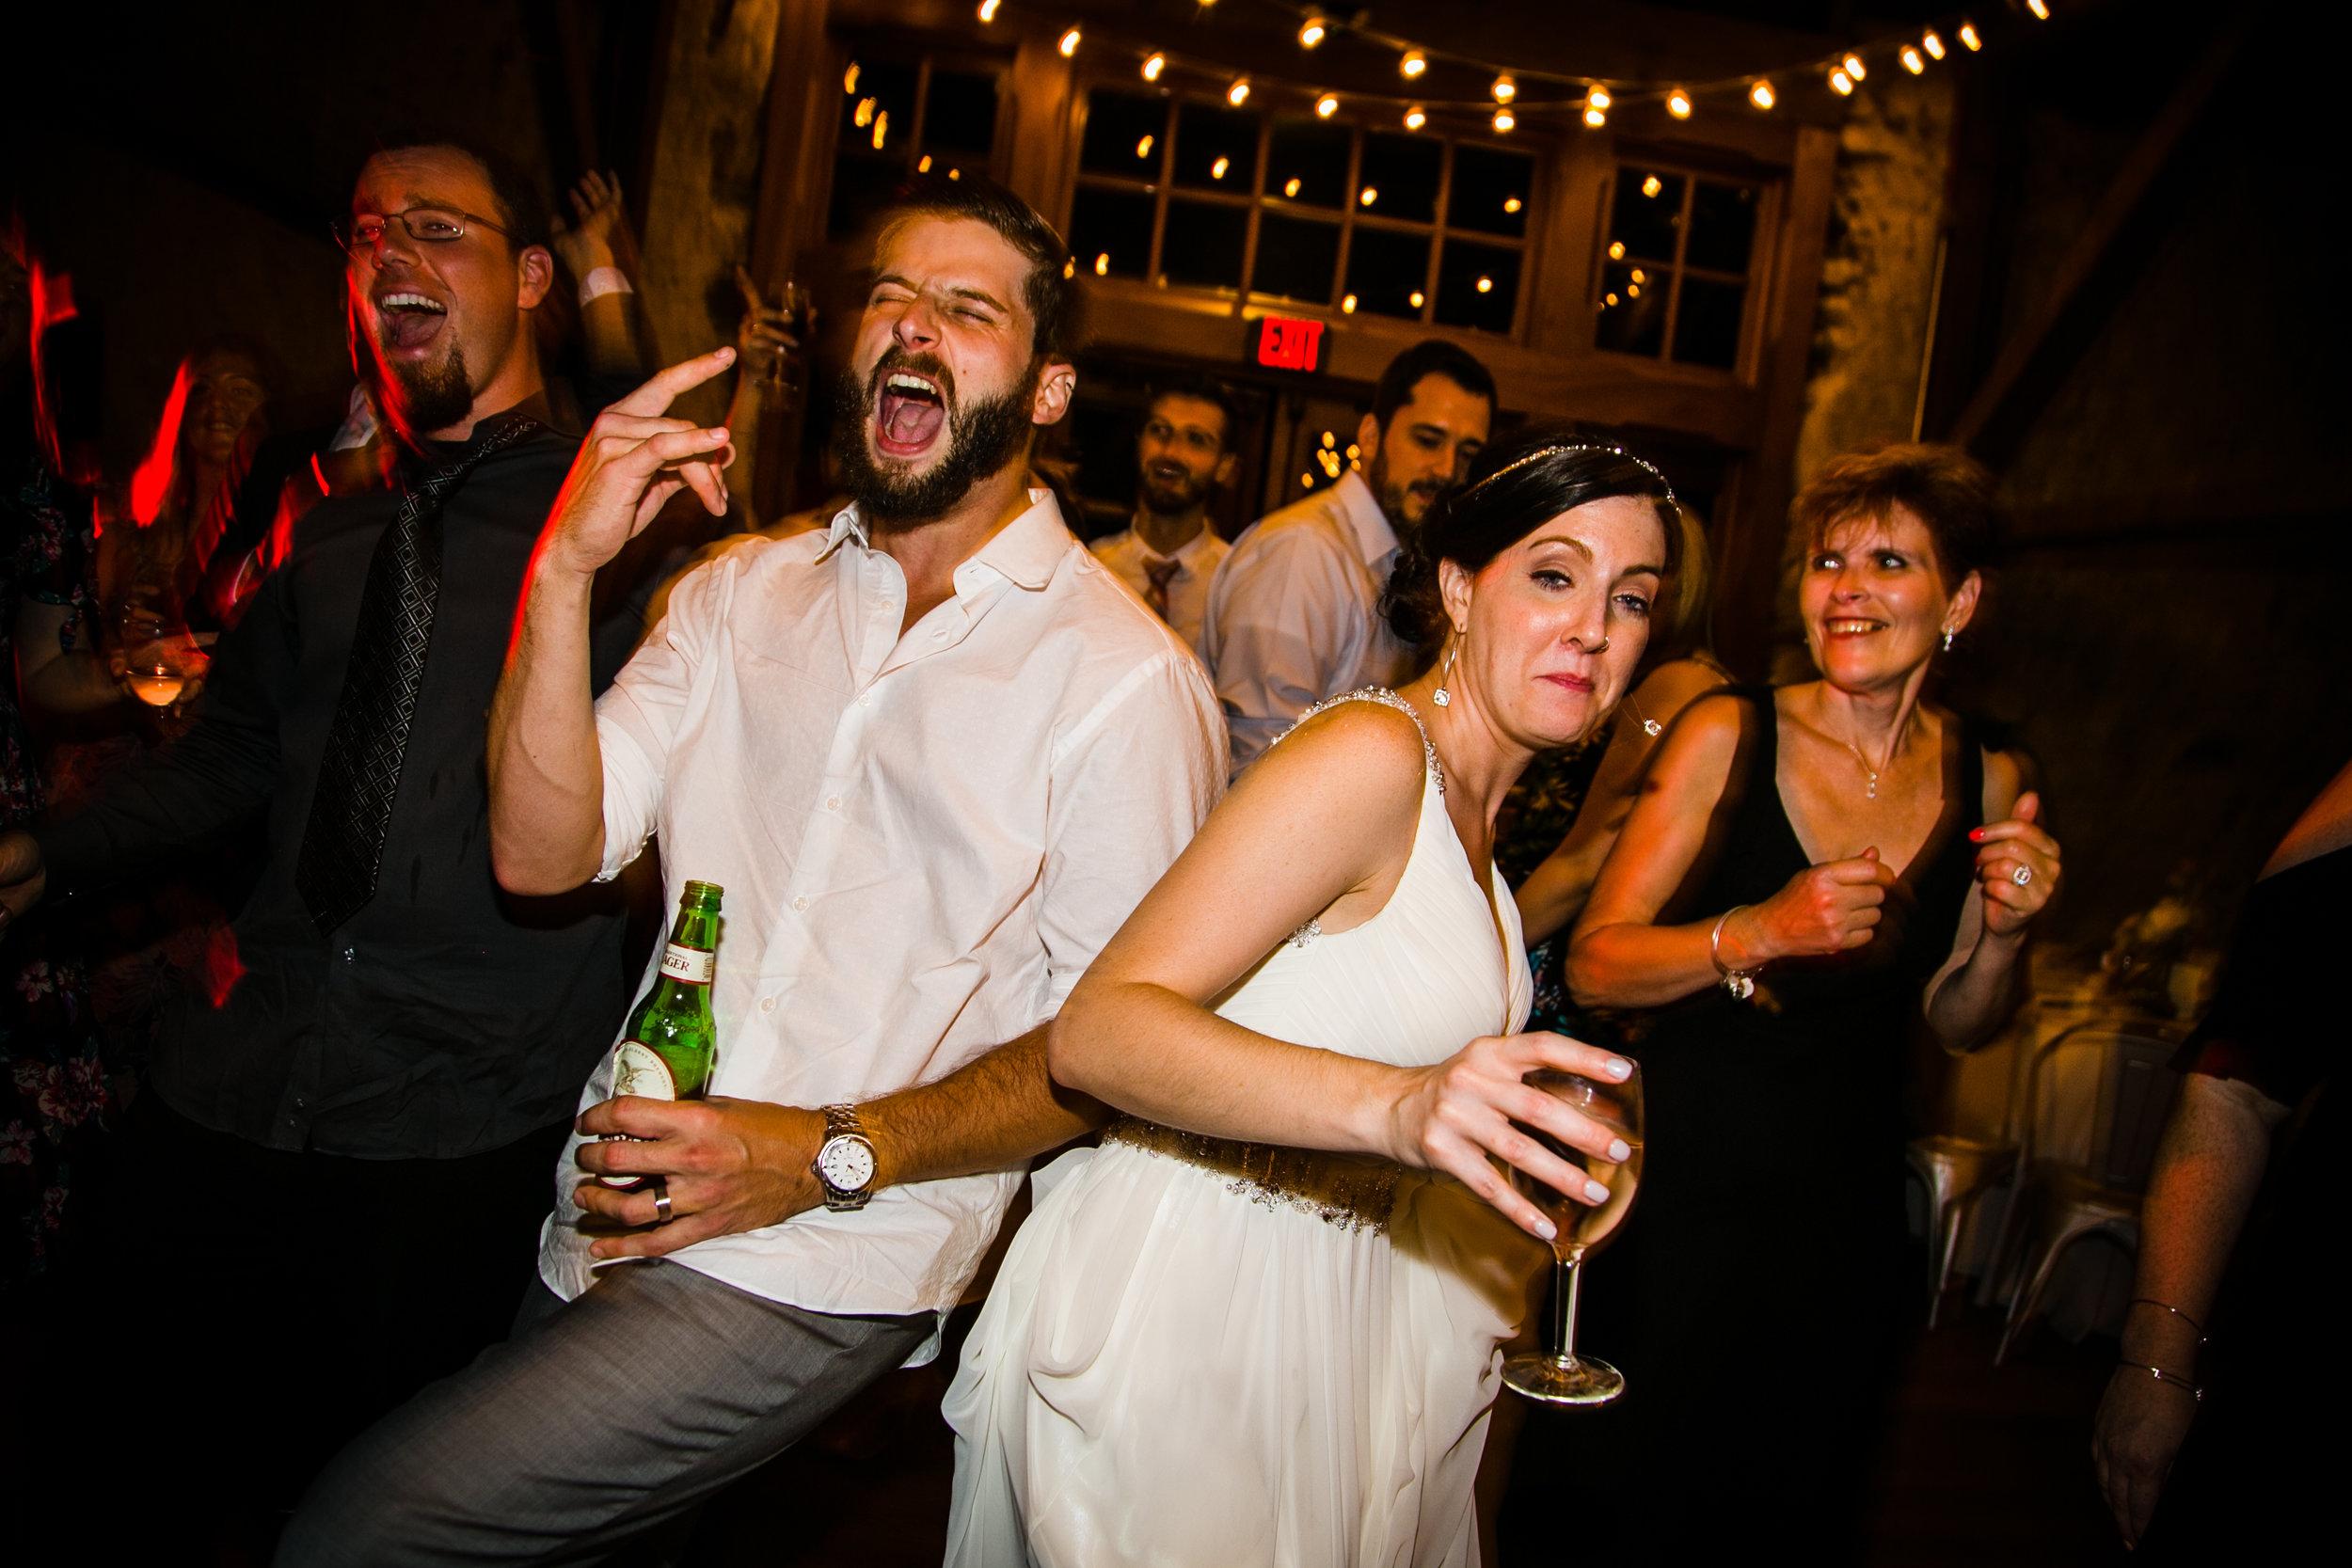 TYLER ARBORETUM WEDDING PHOTOGRAPHY LOVESTRUCK PICTURES-107.jpg